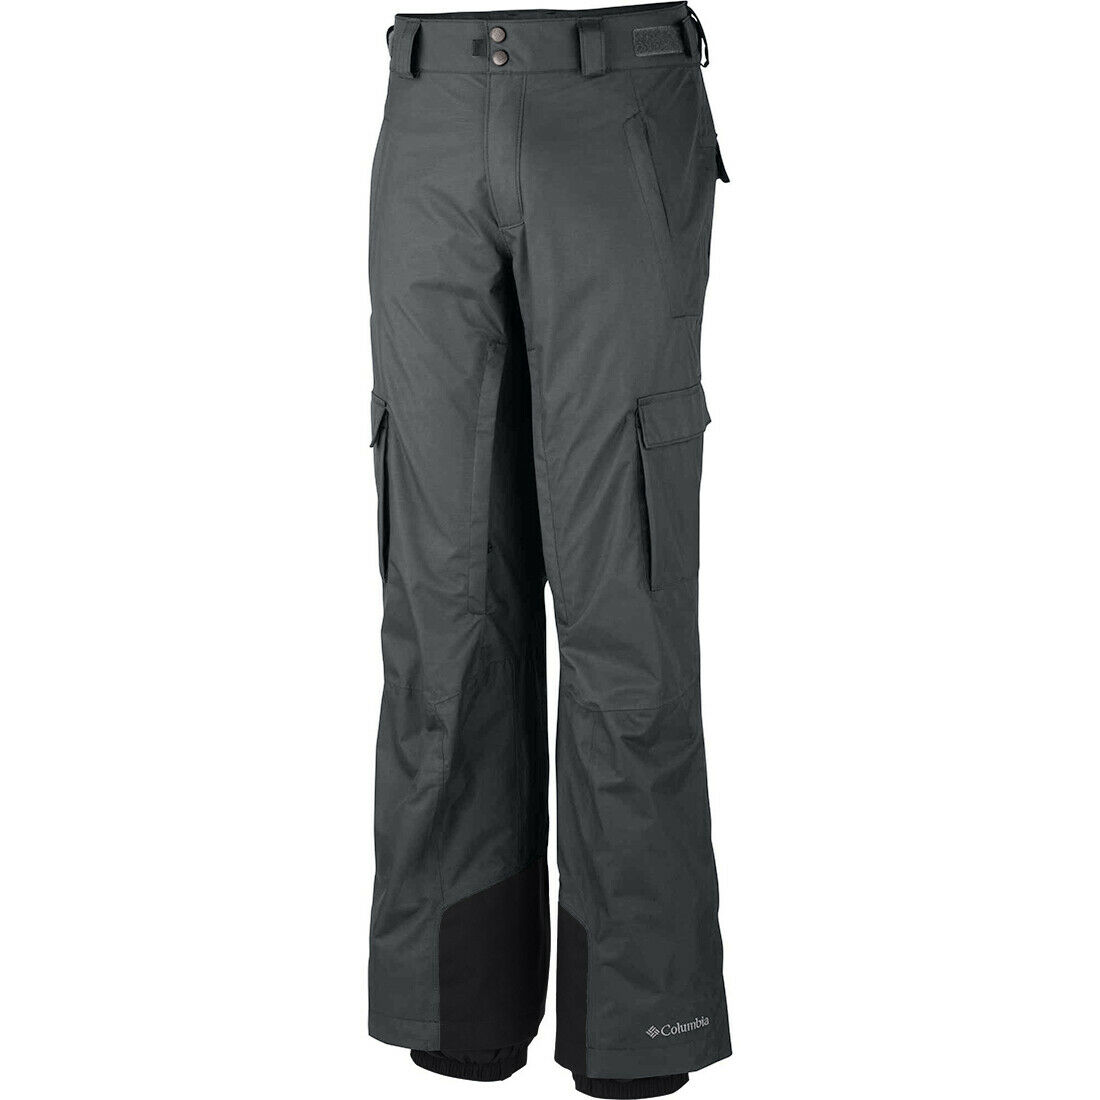 New Mens Columbia  Ridge 2 Run II  Omni-Heat Waterproof Winter Ski Pants